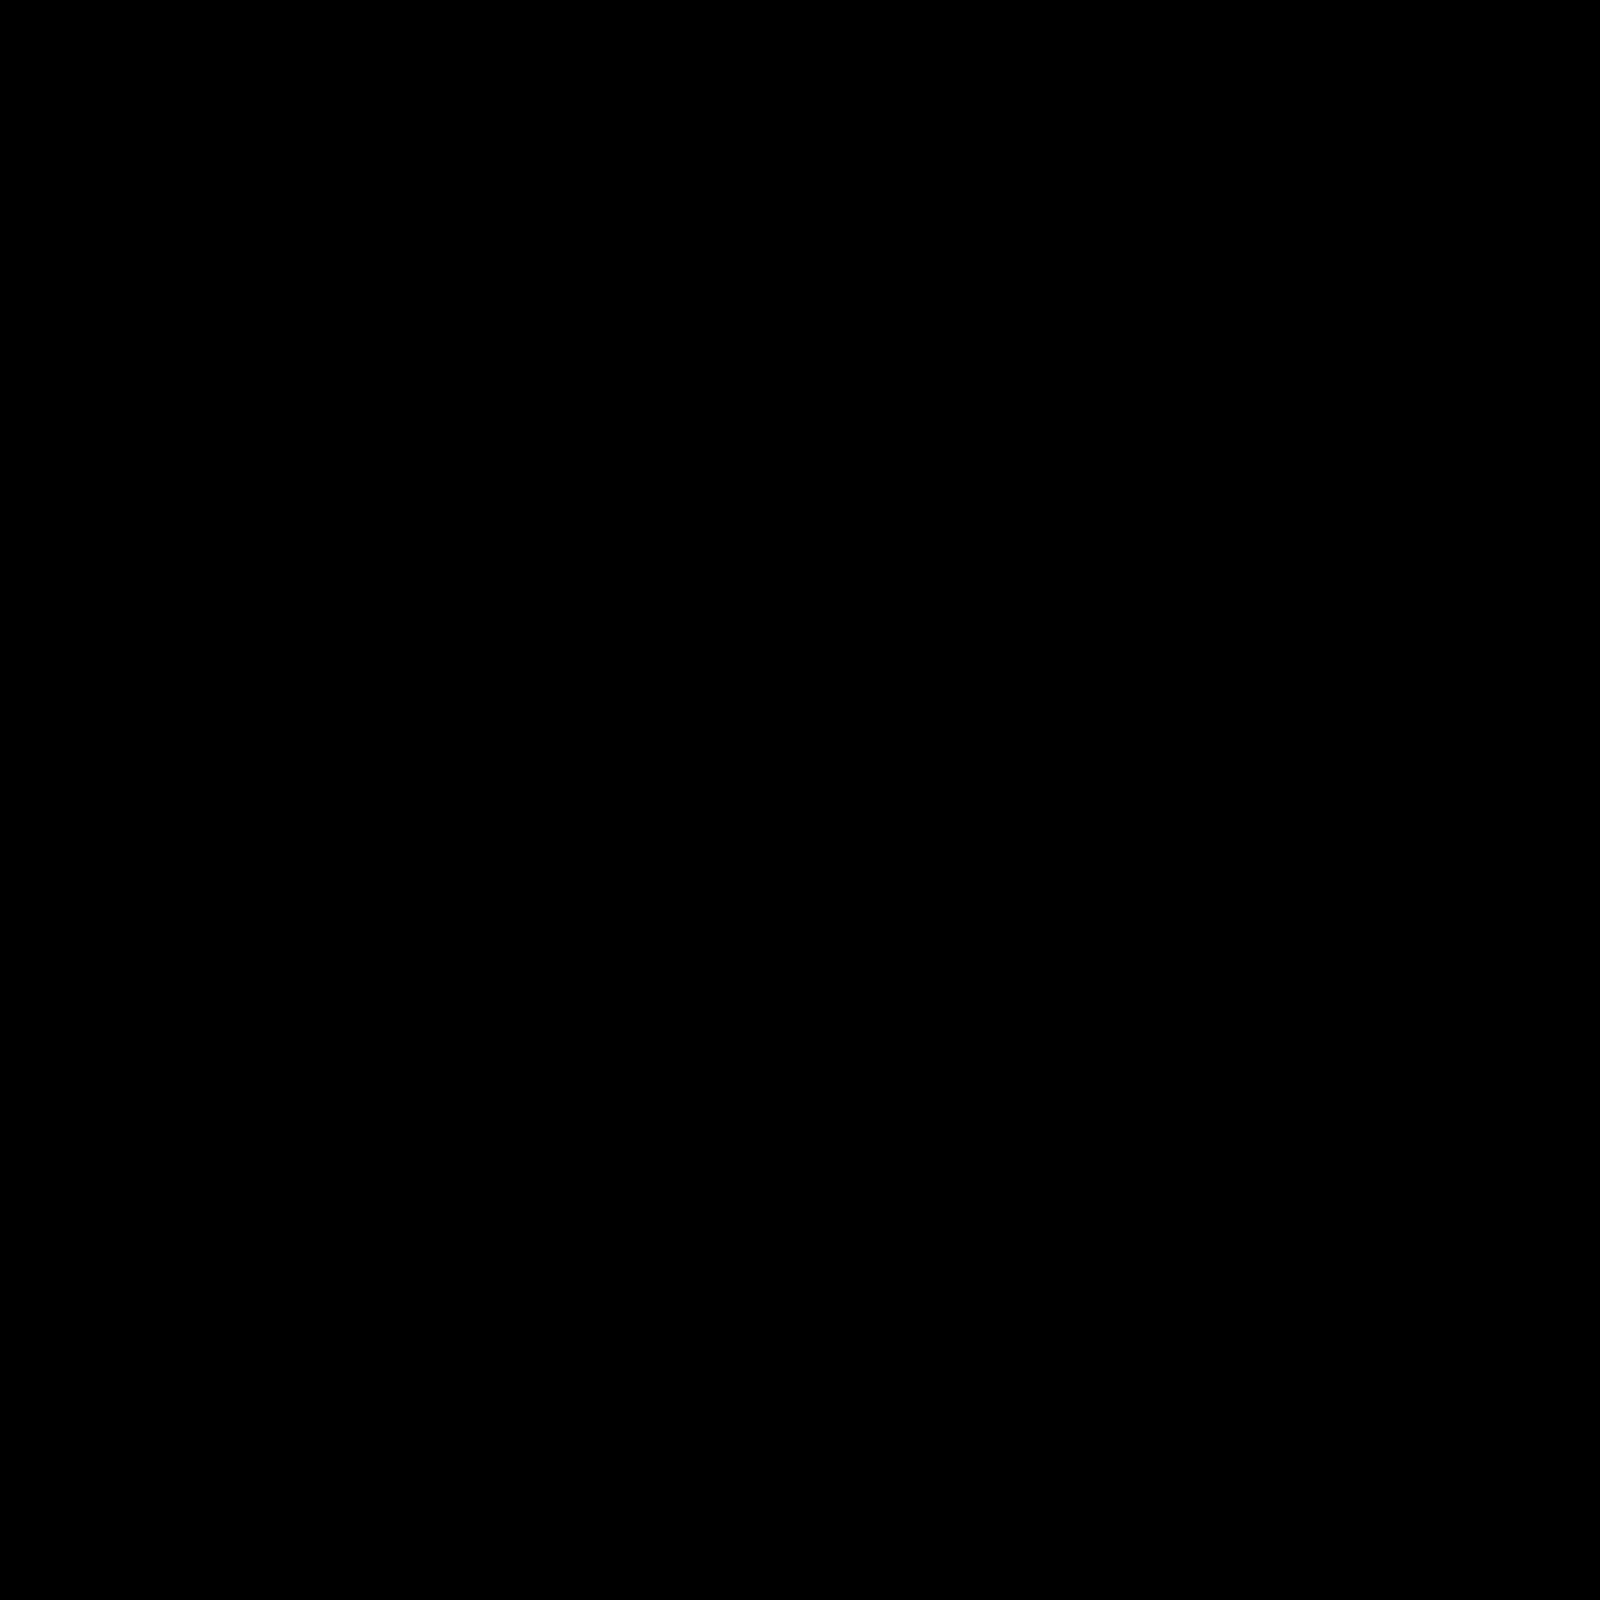 Доставка еды icon